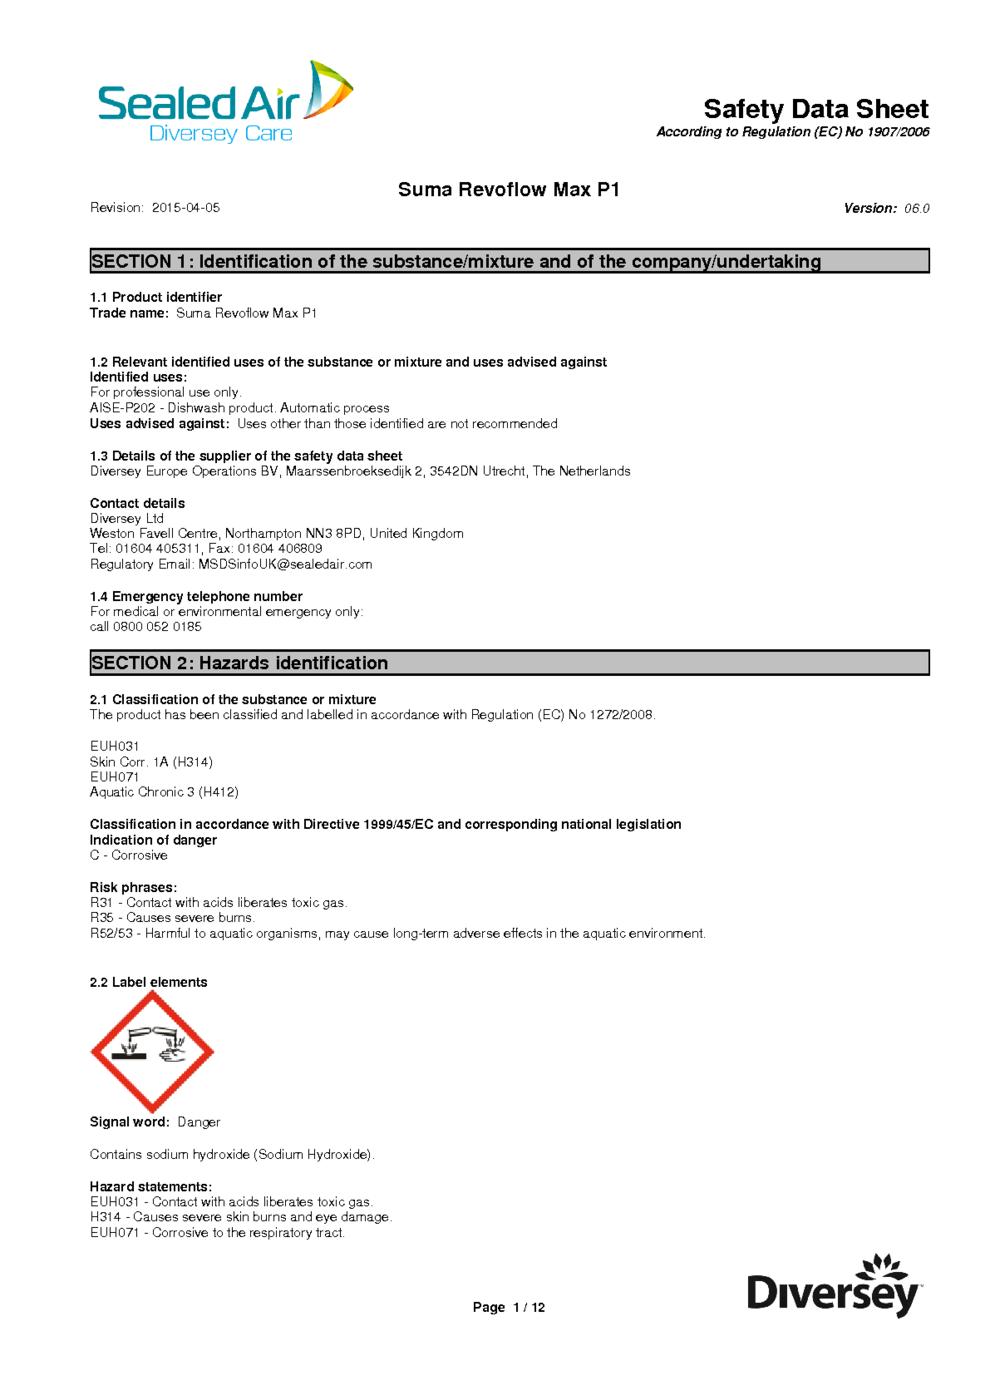 Suma Revoflow Max P1 Safety Data Sheet Download () MSDS - GHS/CLP ...